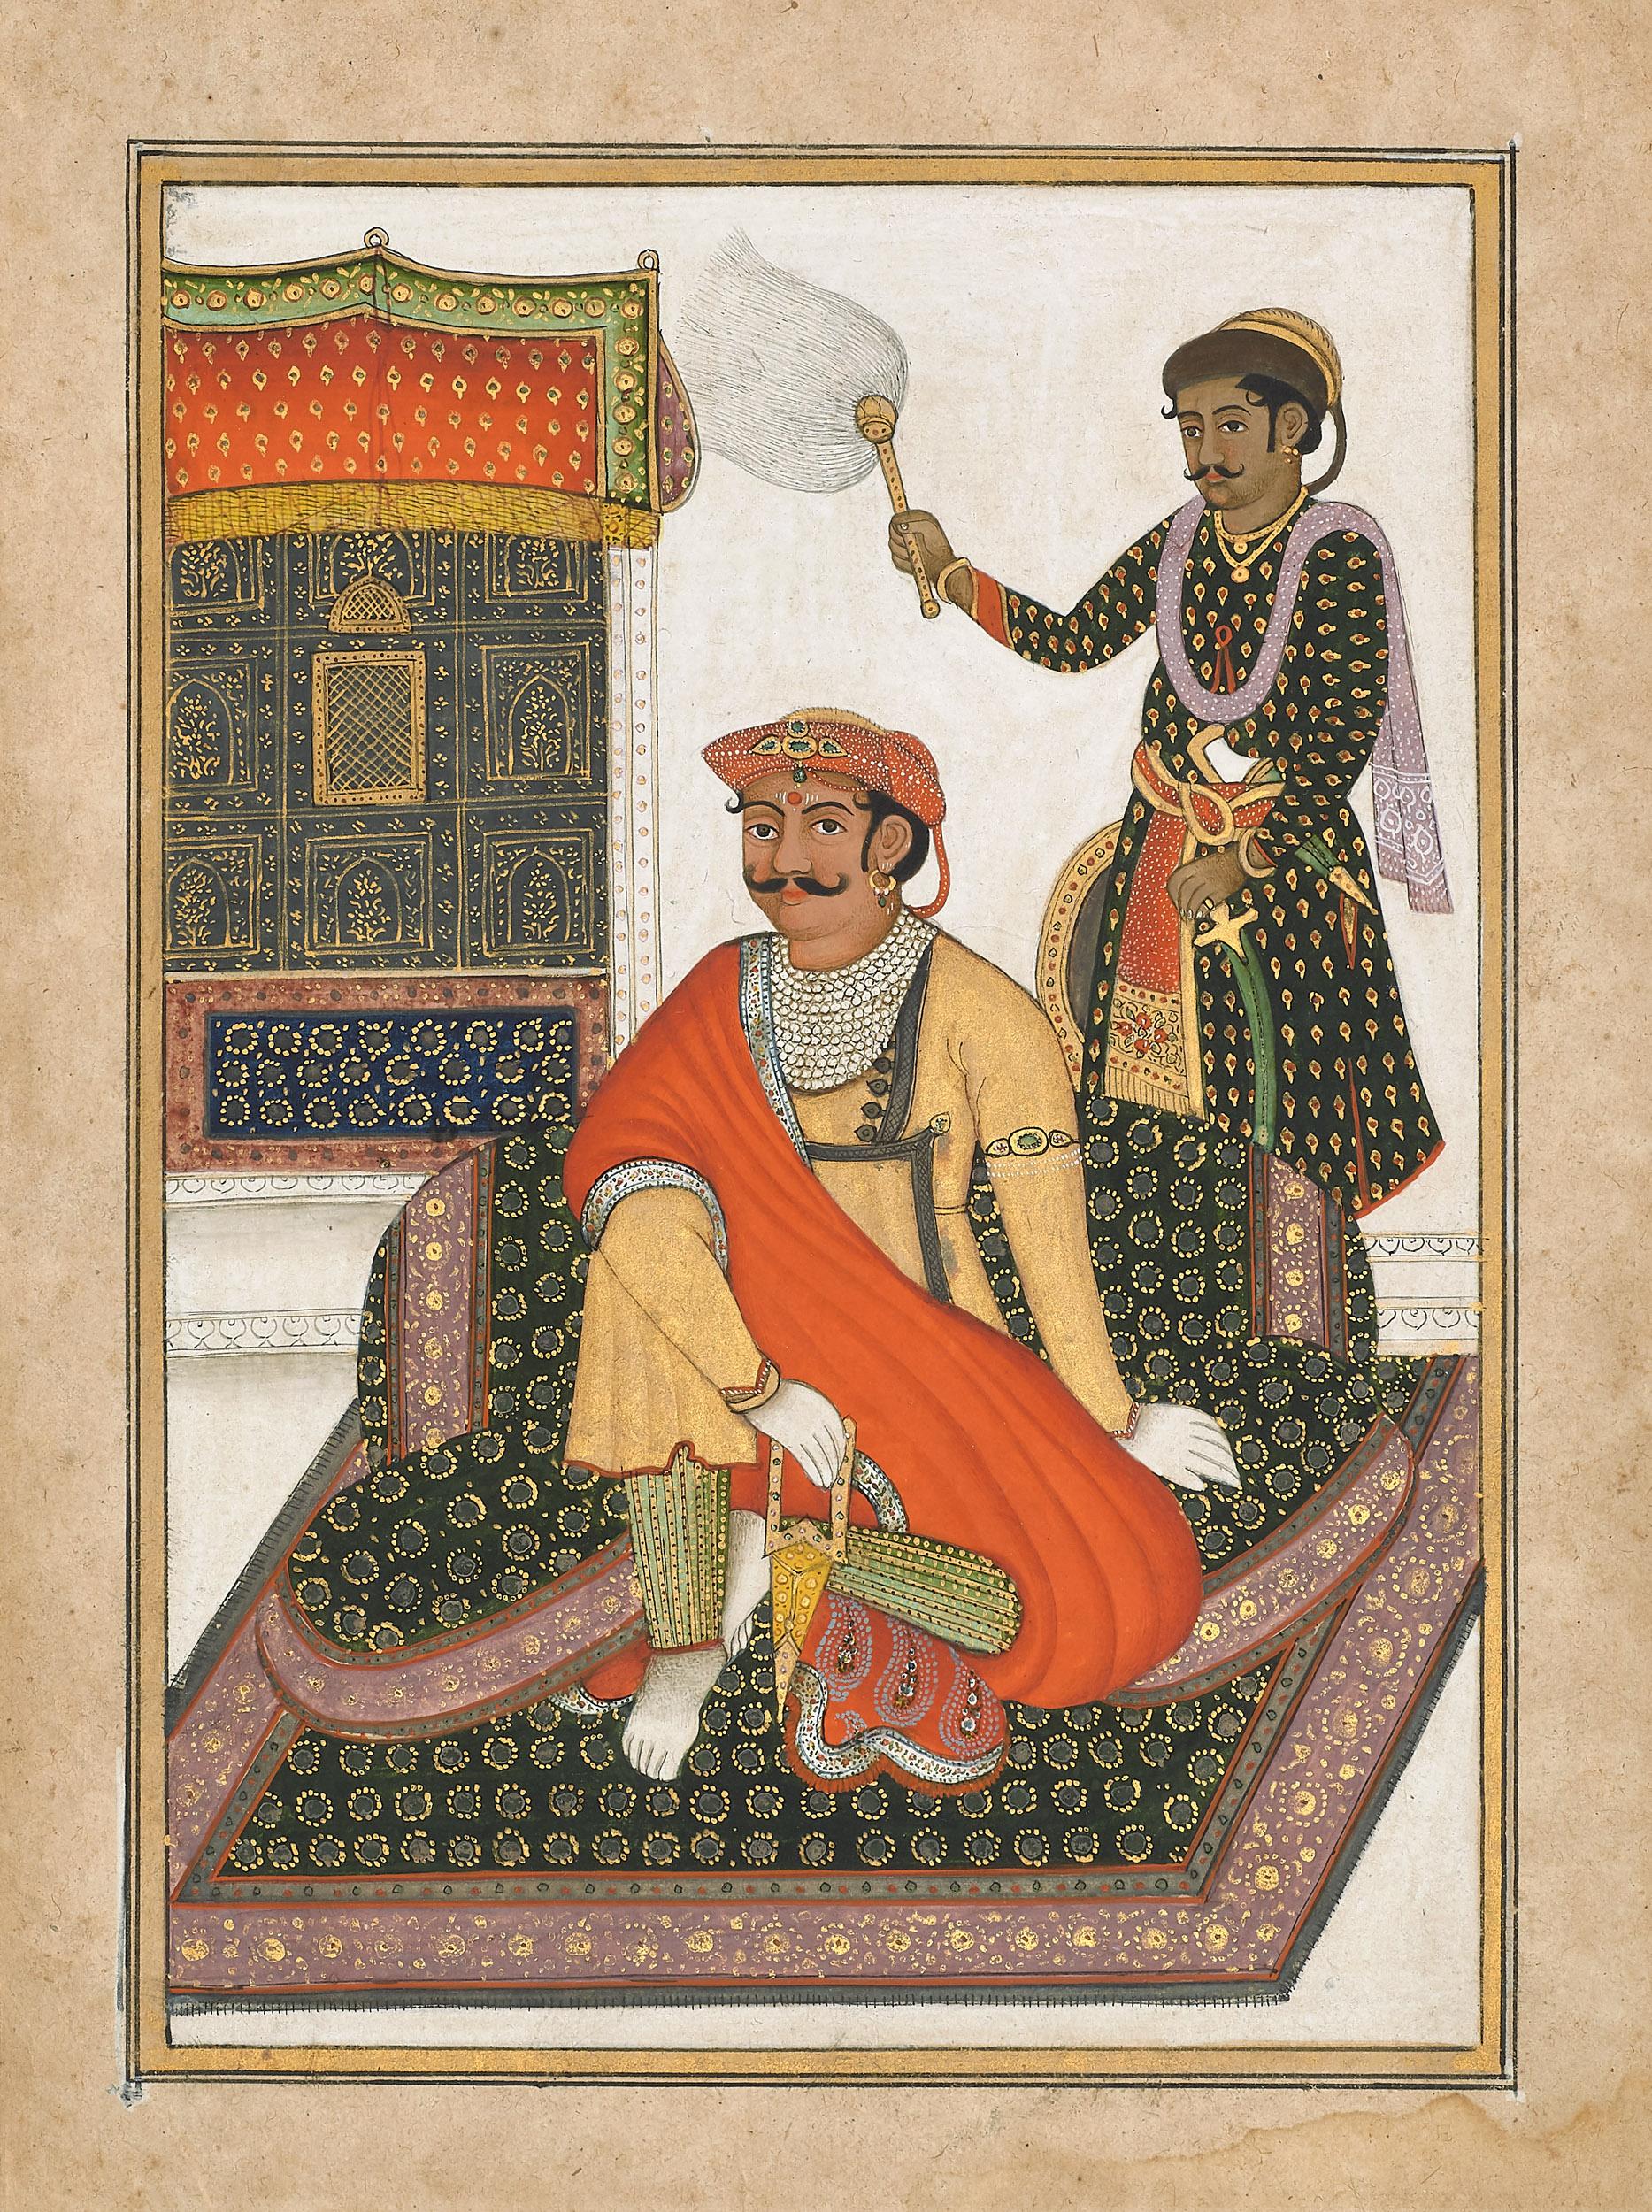 Daulat Rao Scindia of Gwalior